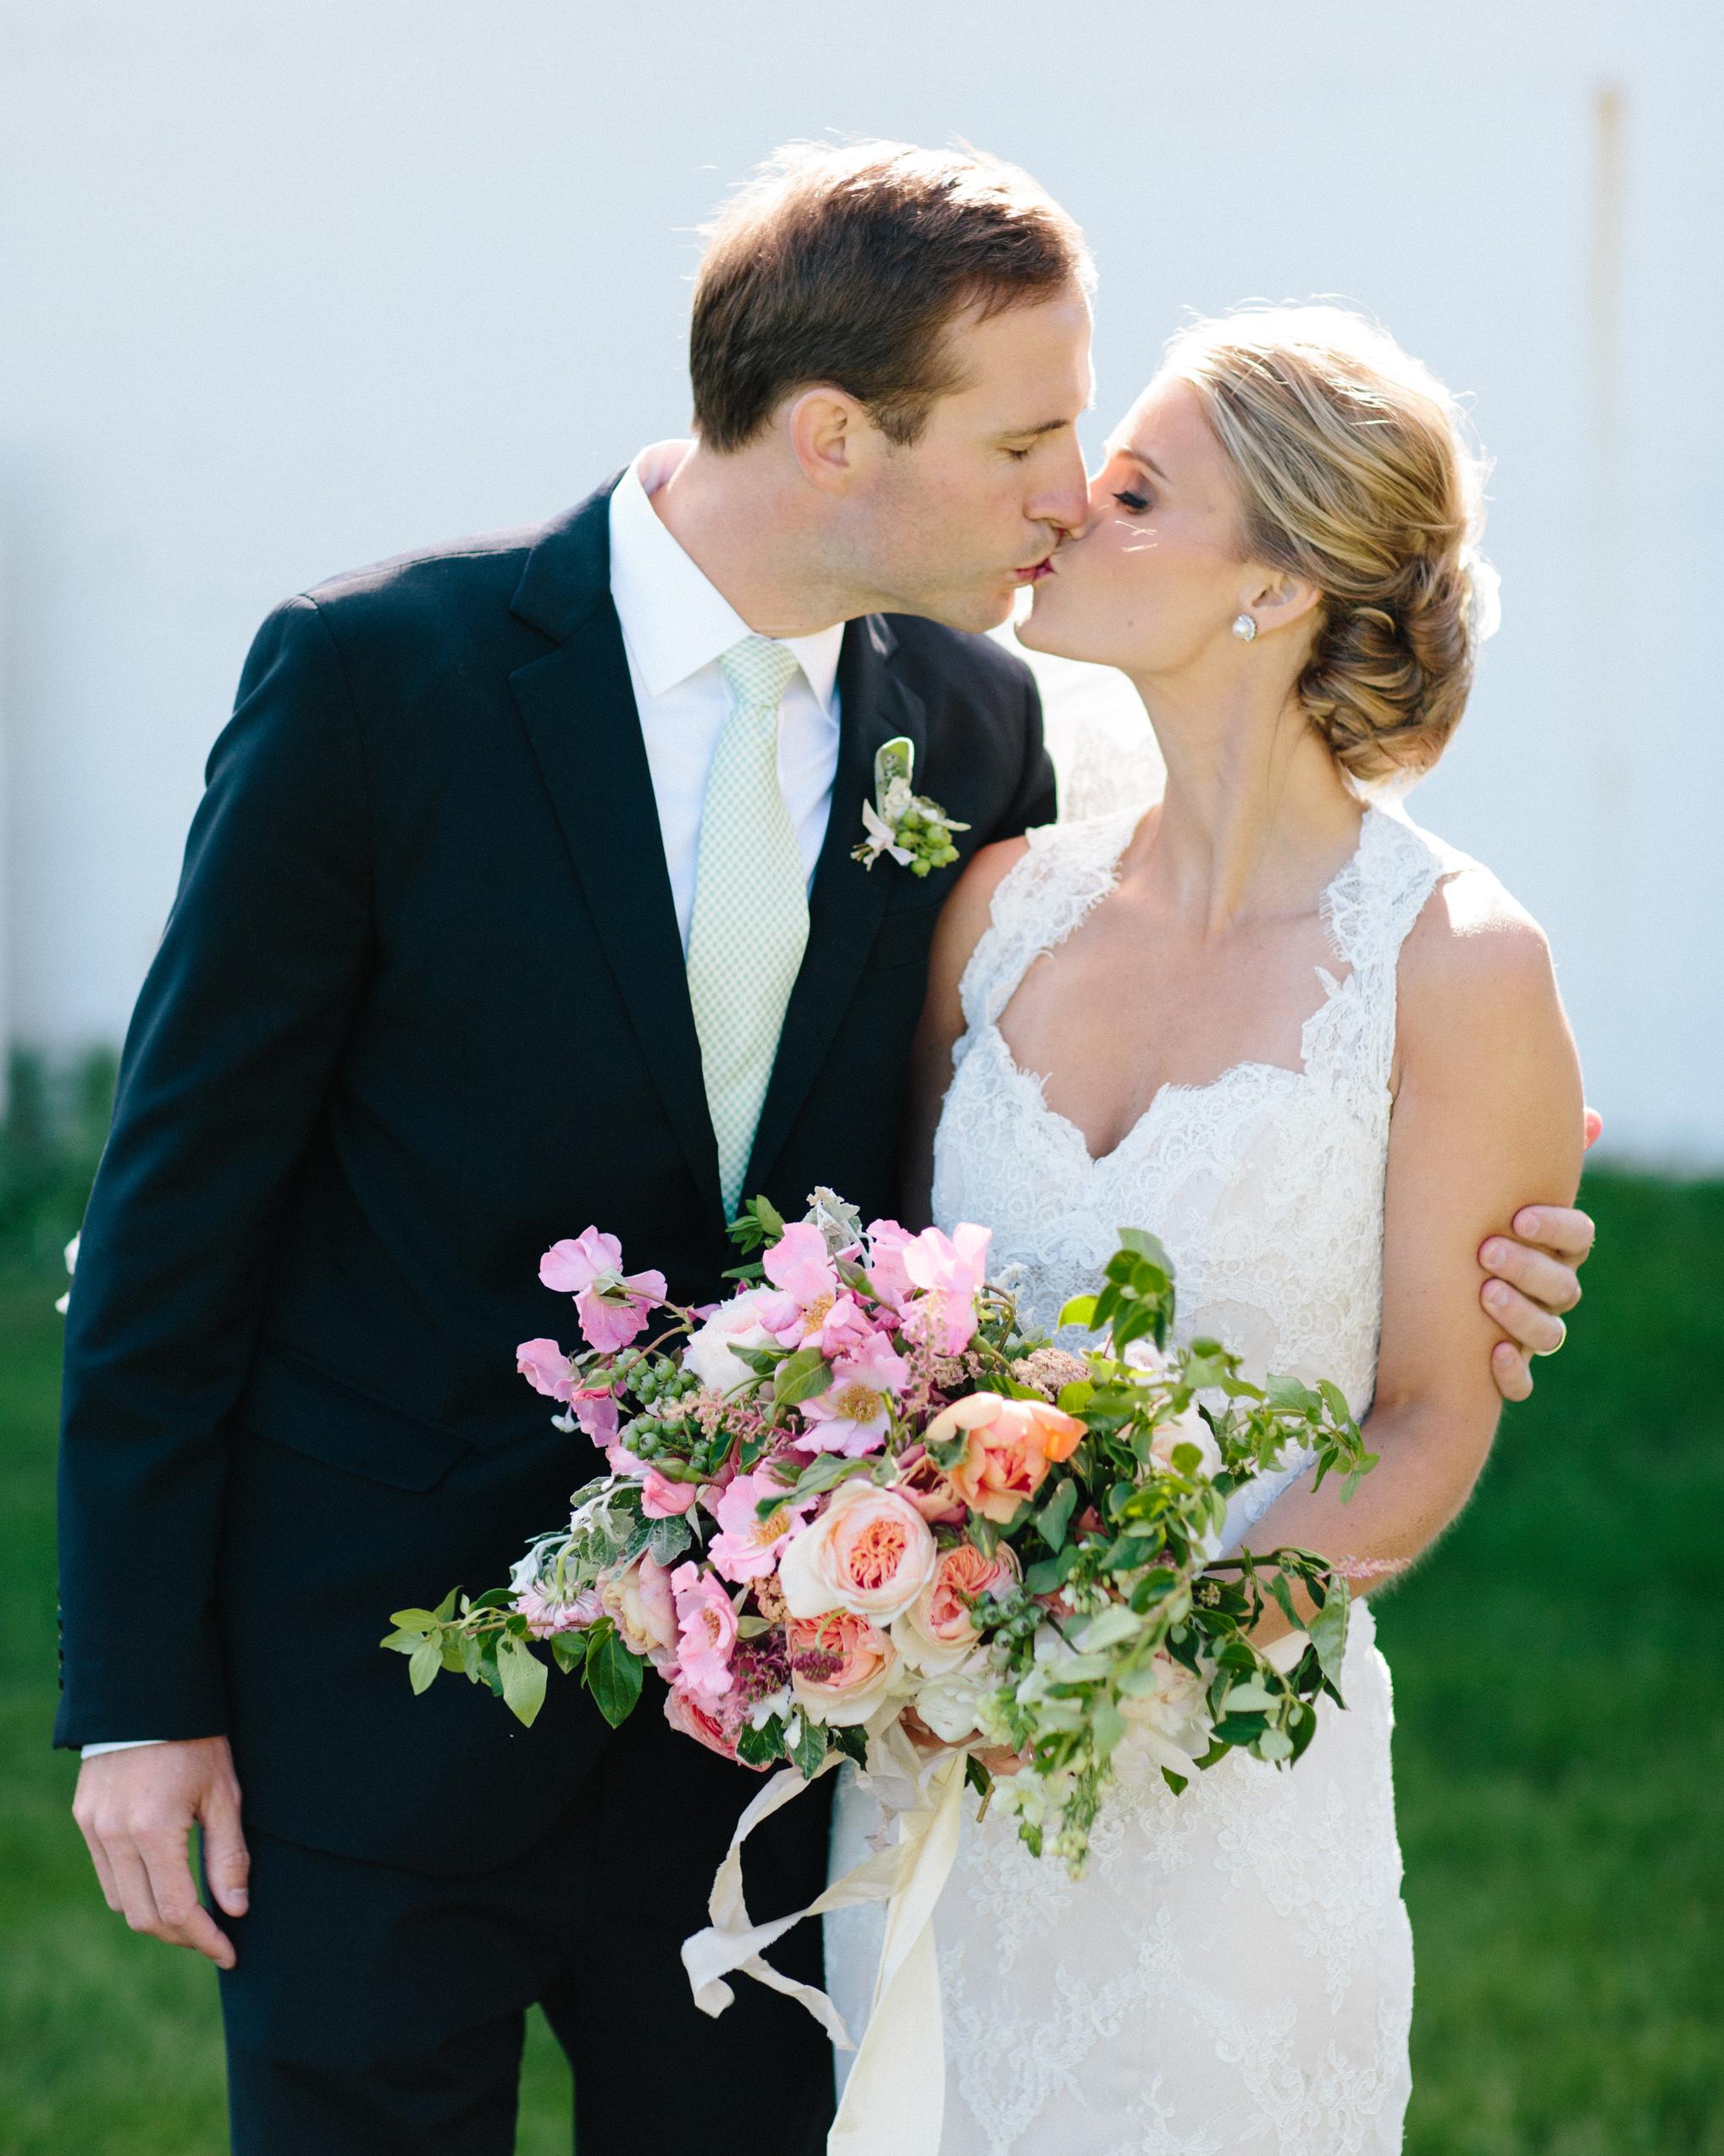 jamie-alex-wedding-couple-103-s111544-1014.jpg